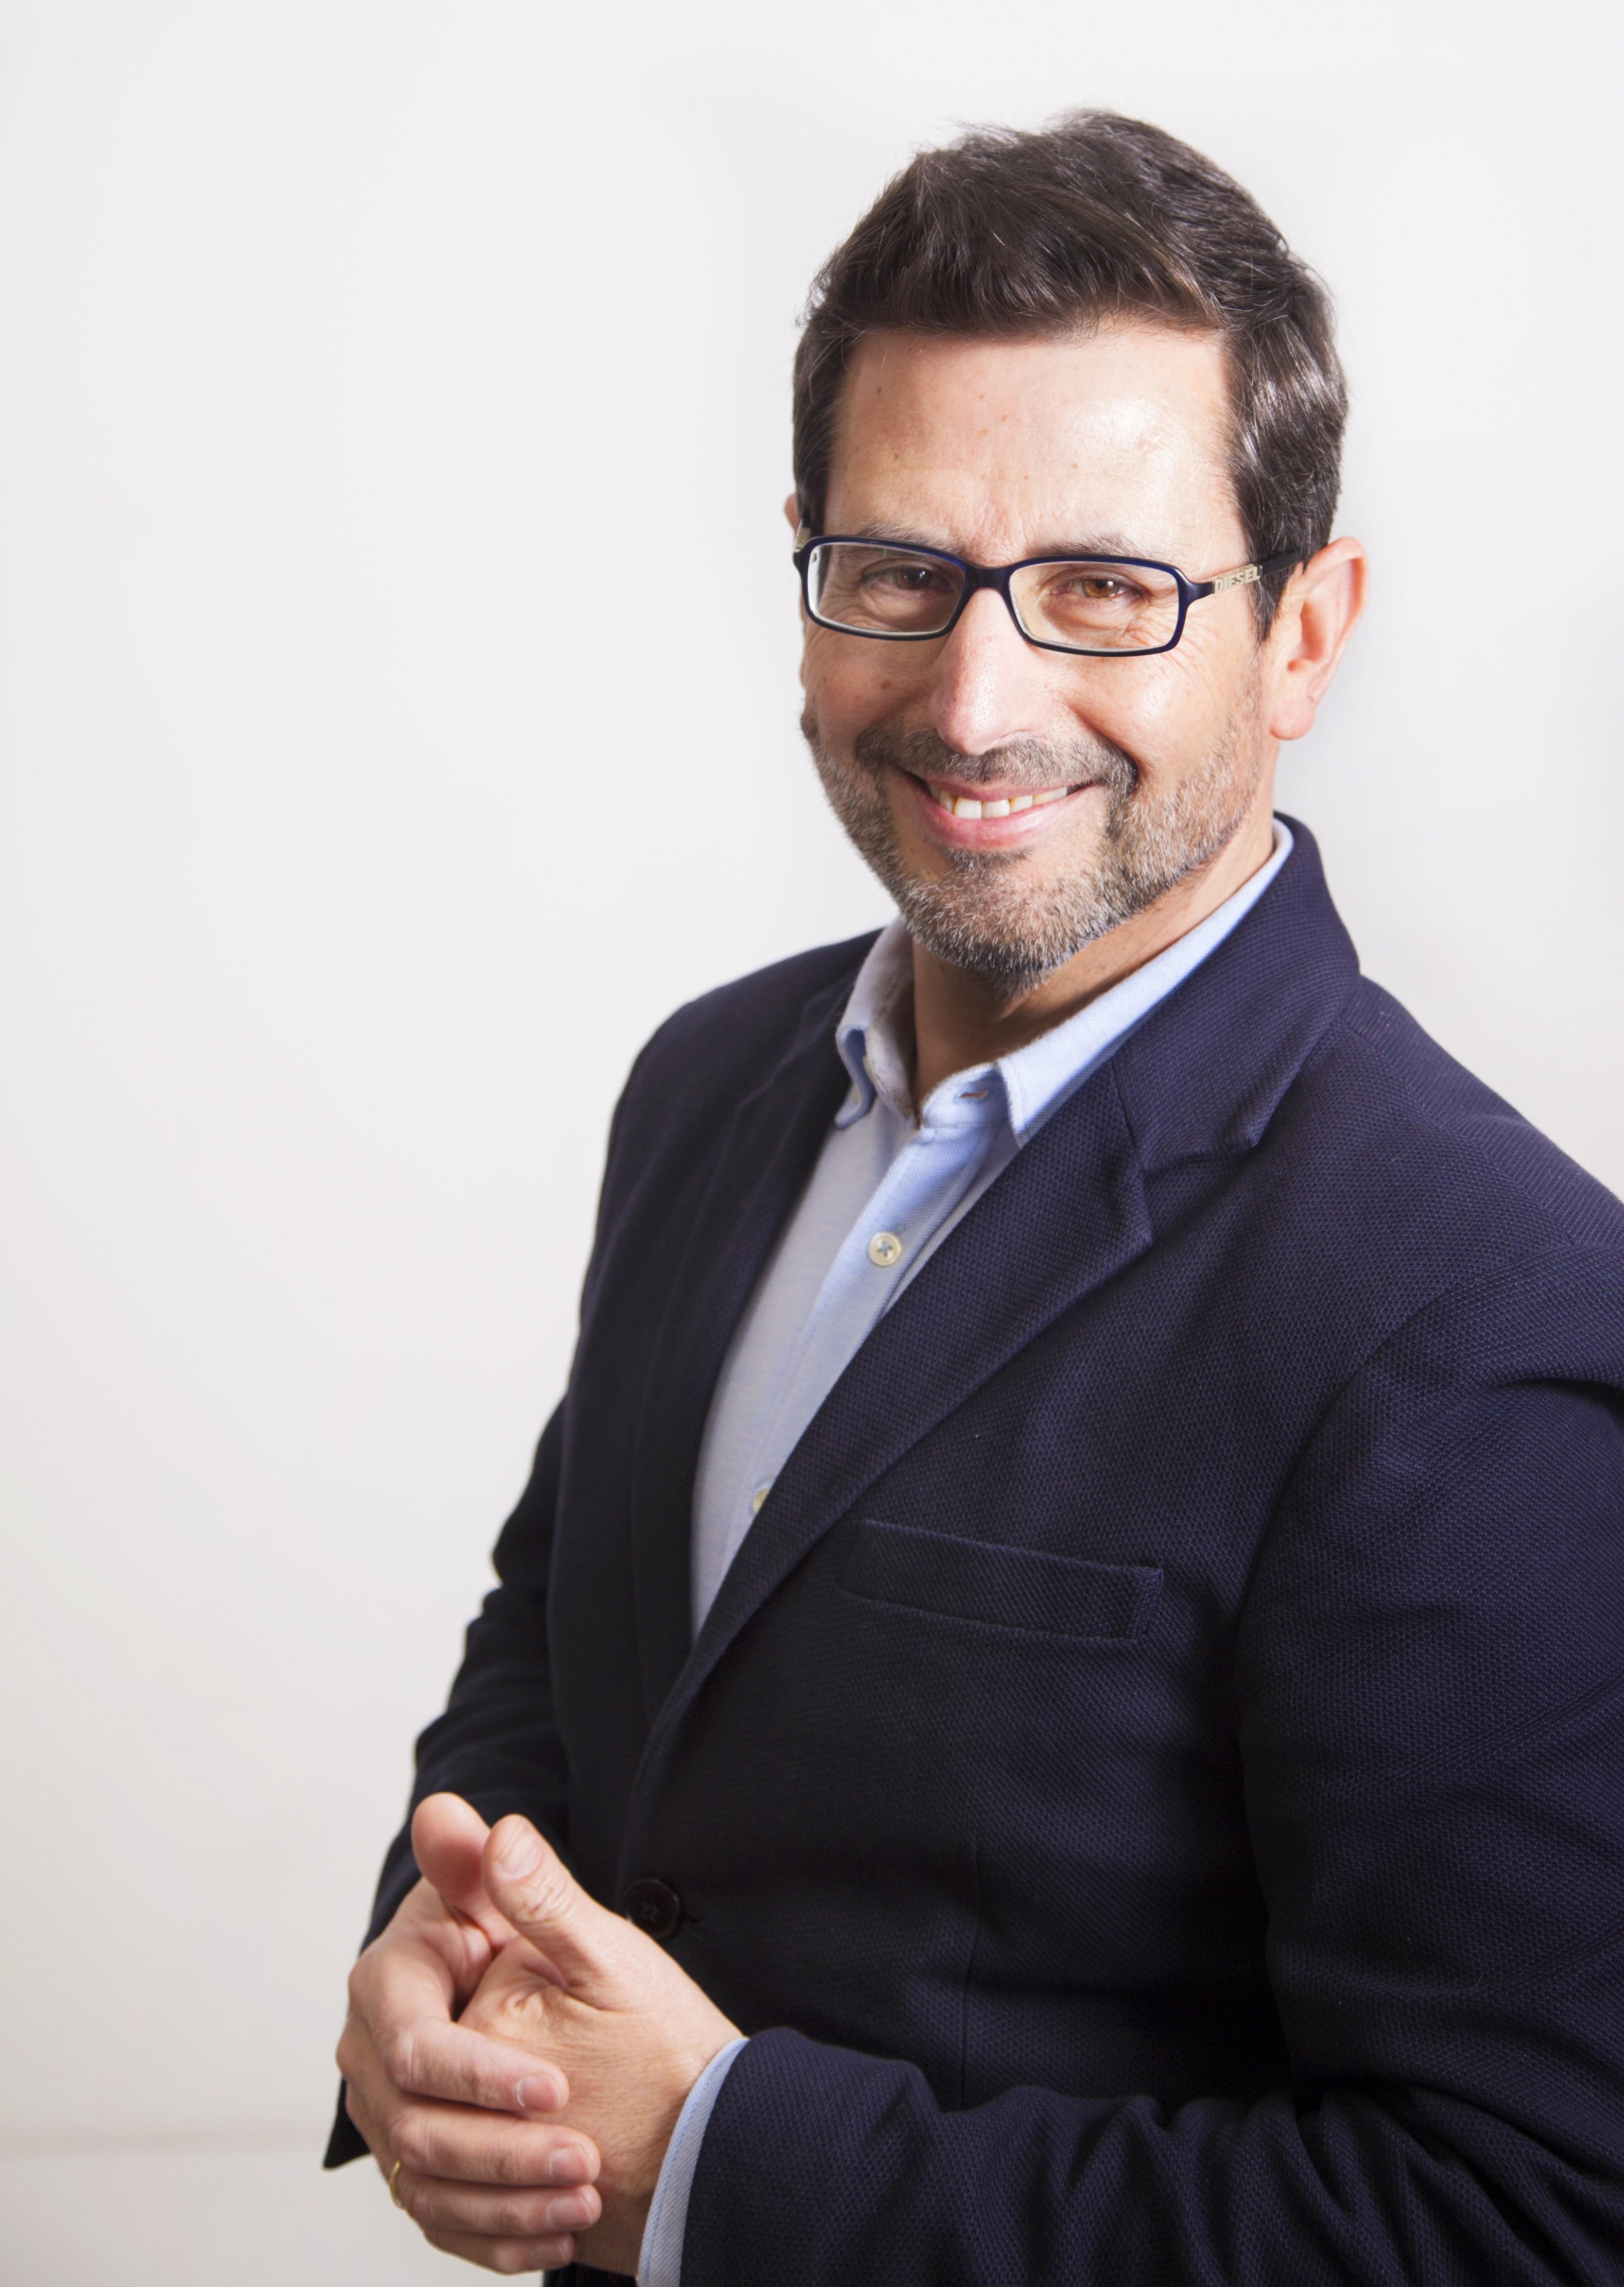 Francisco Javier Mejia De Hita